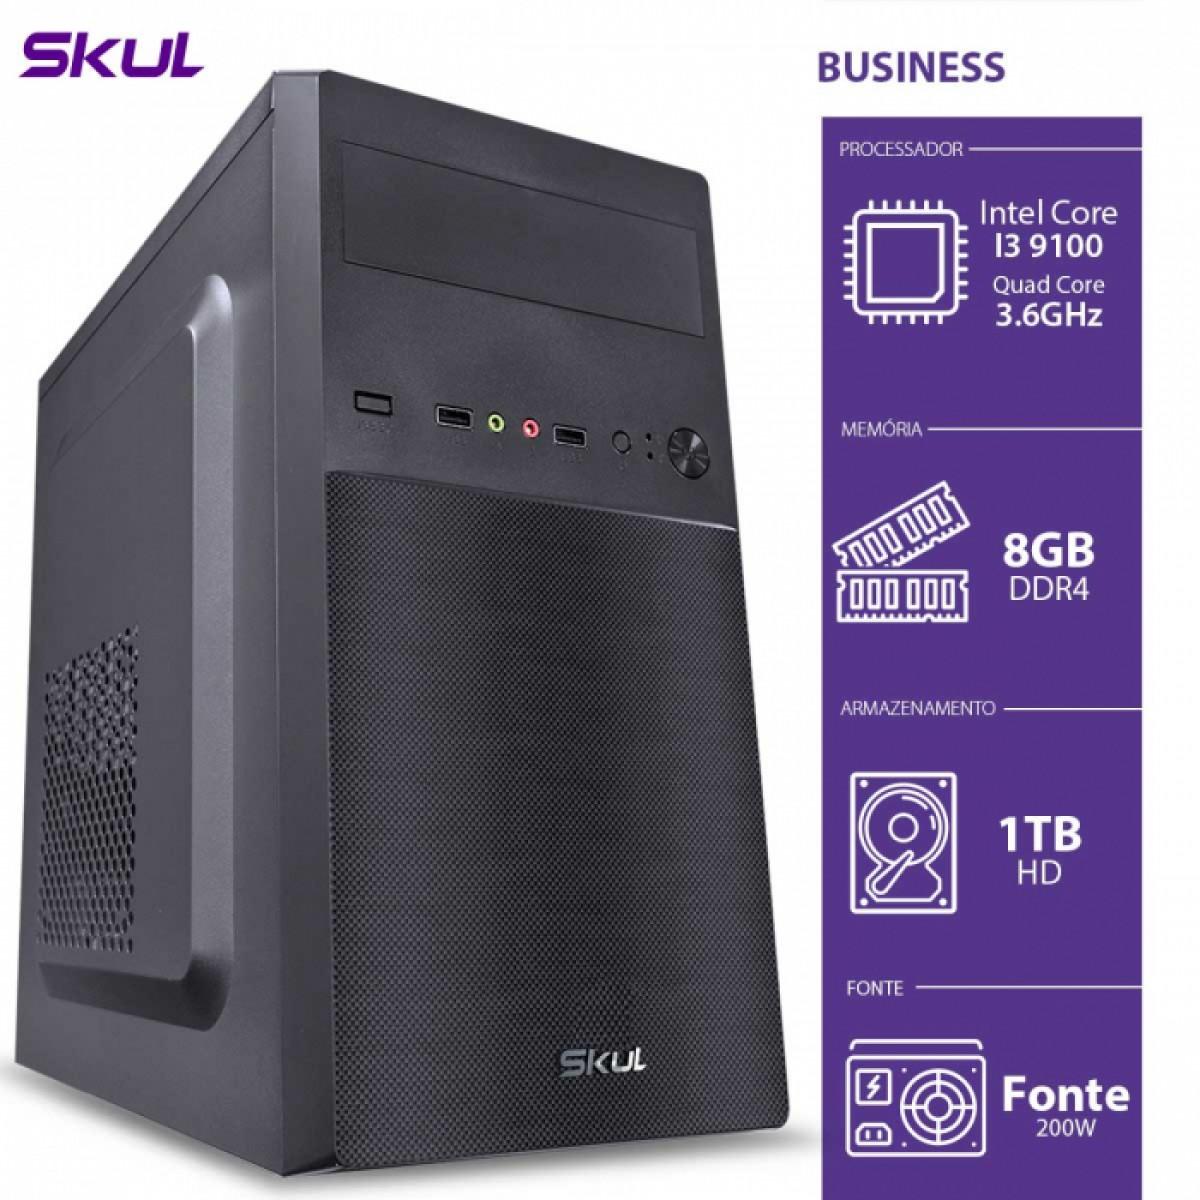 Computador Skul T-Moba Business B300 i3 9100 / 8GB DDR4 / HD 1TB  / HDMI/VGA / FONTE 200W